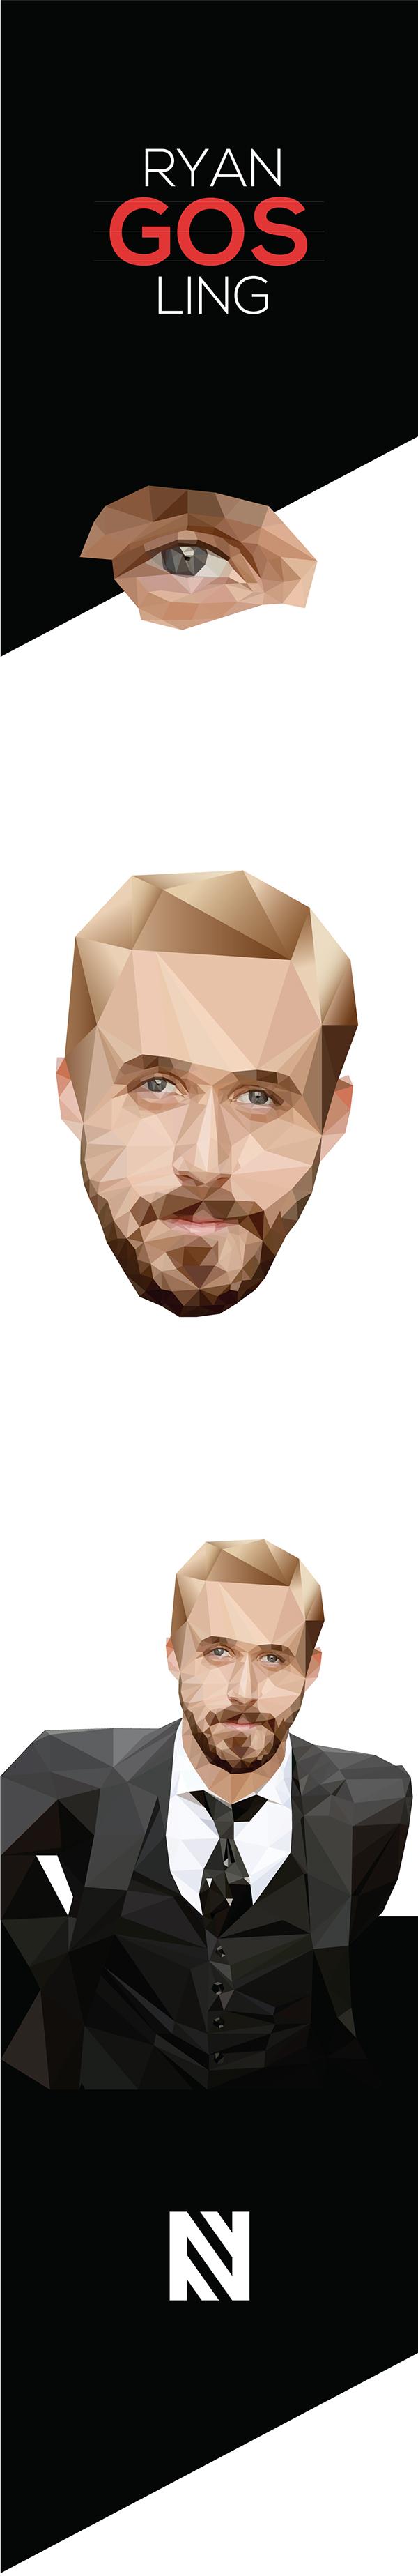 Digital Illustration - Ryan Gosling